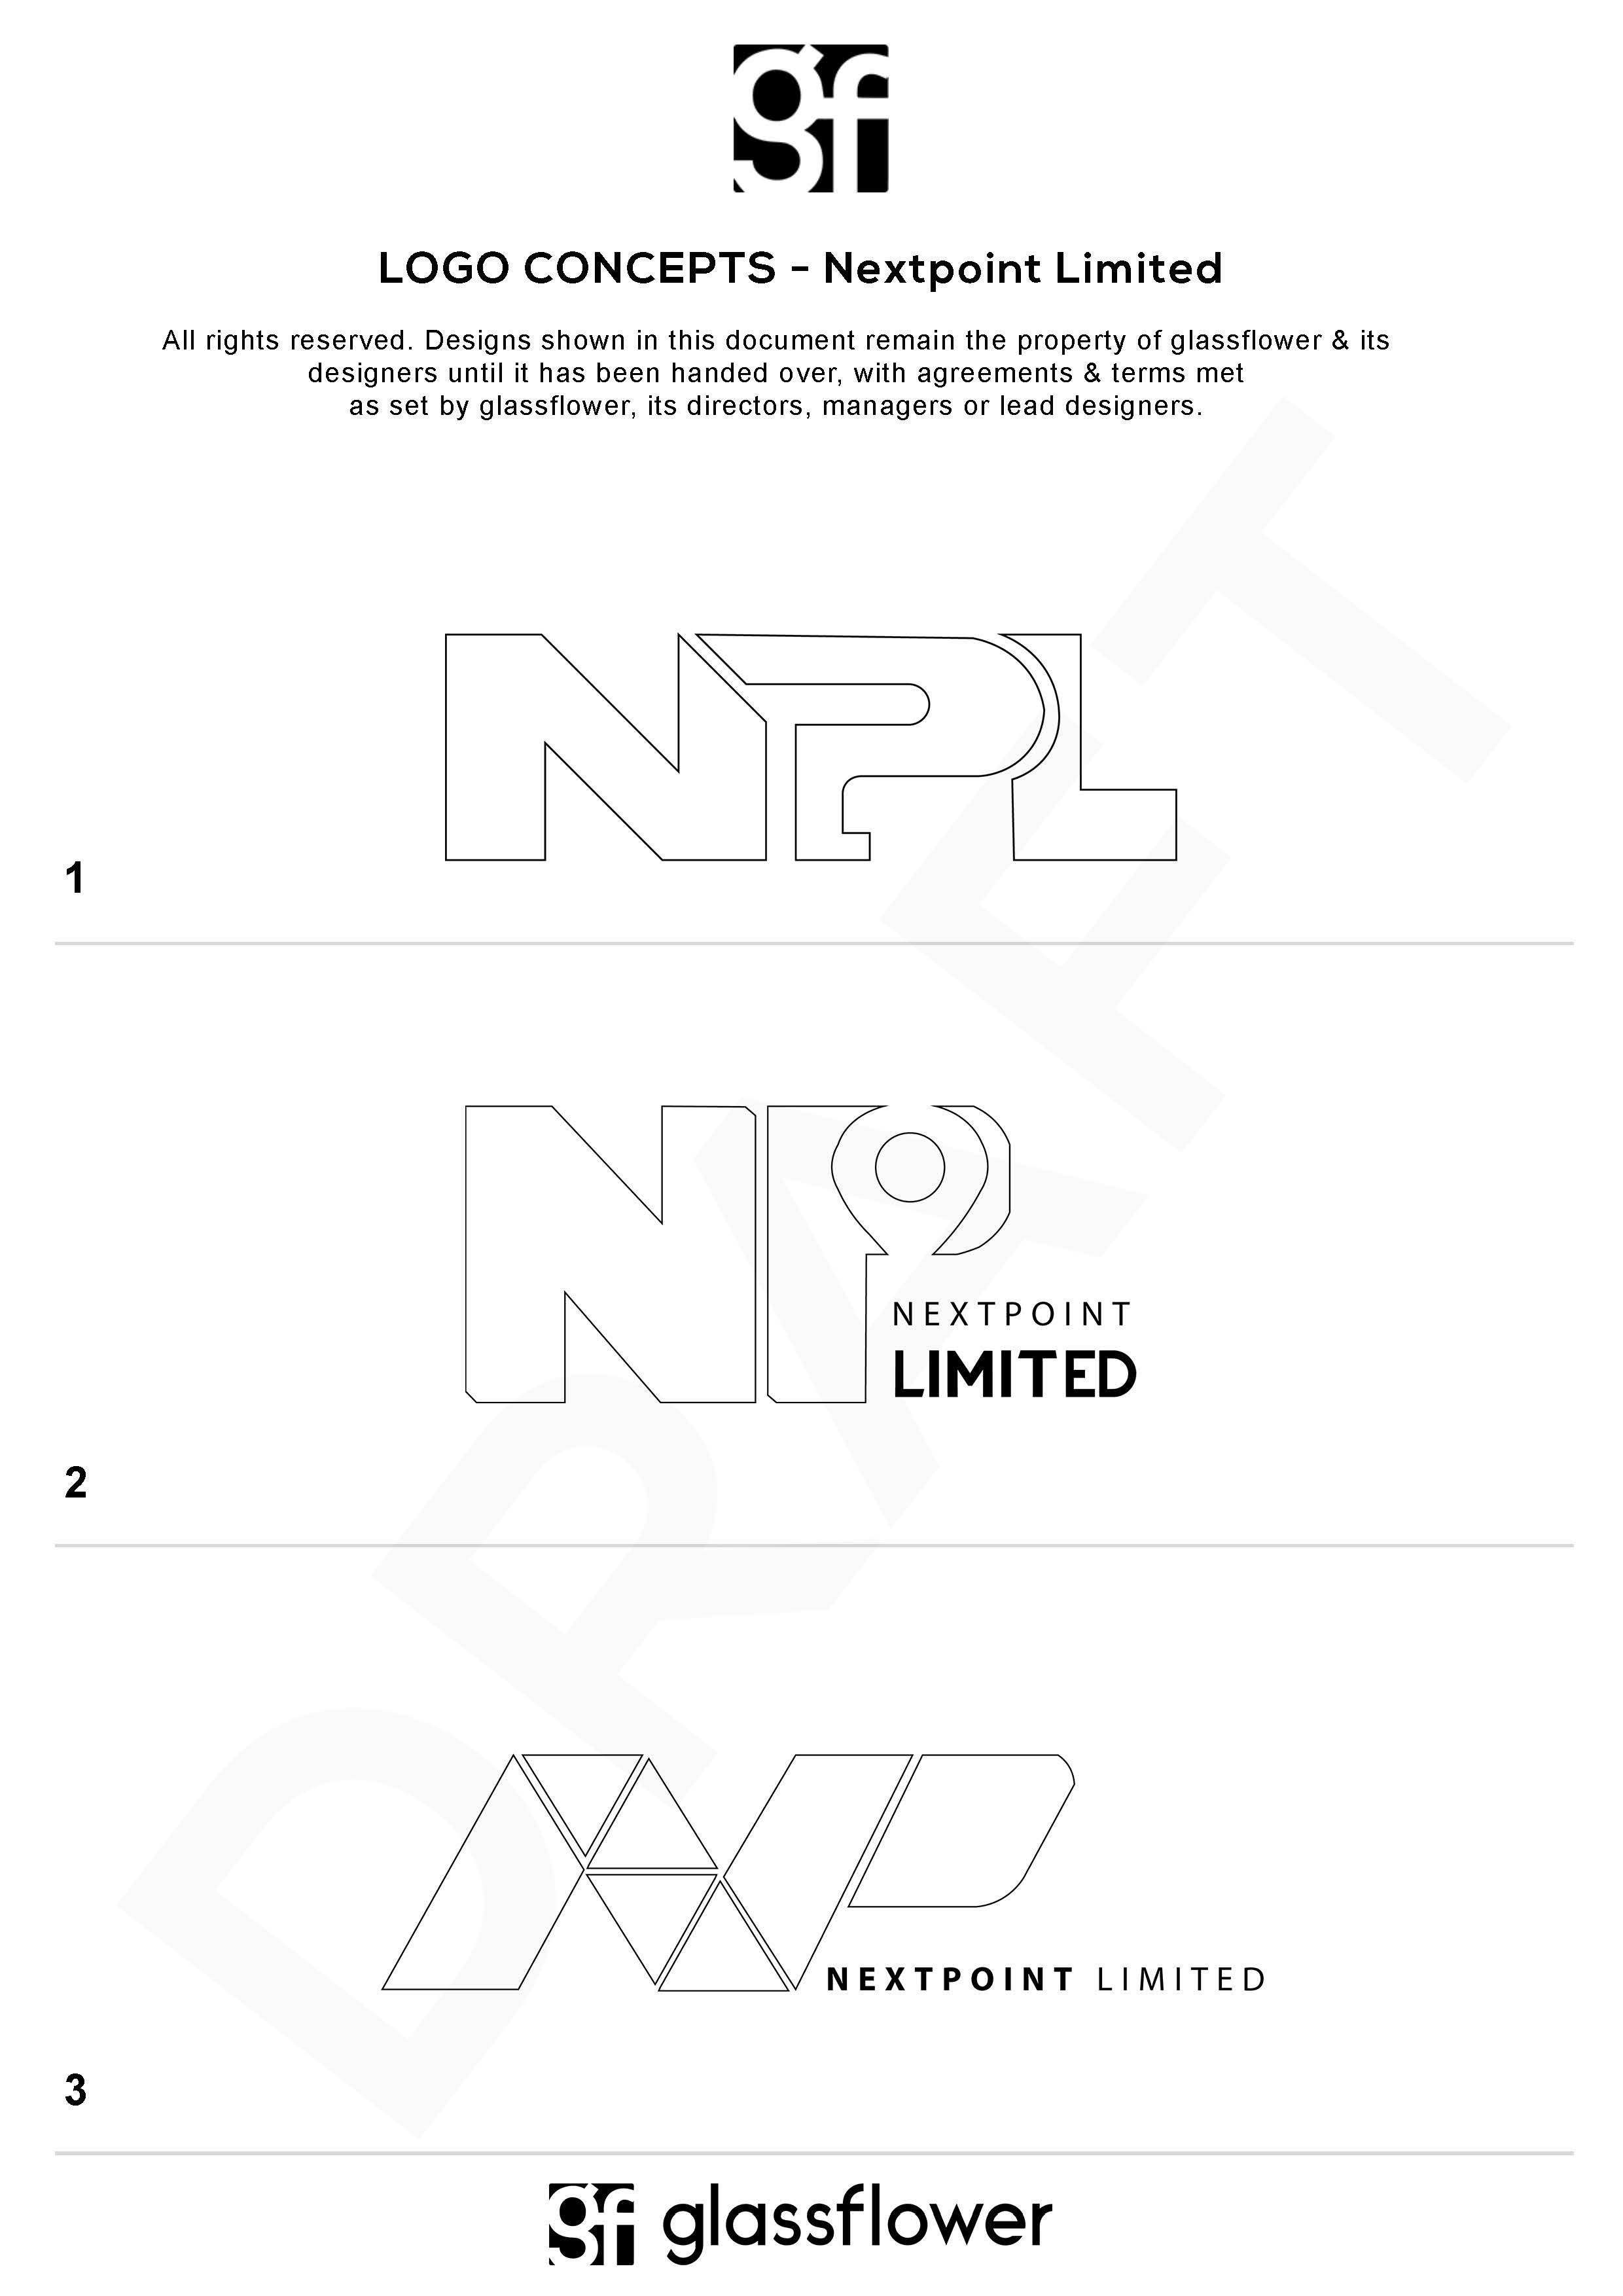 Nextpoint Limited – Wireframe